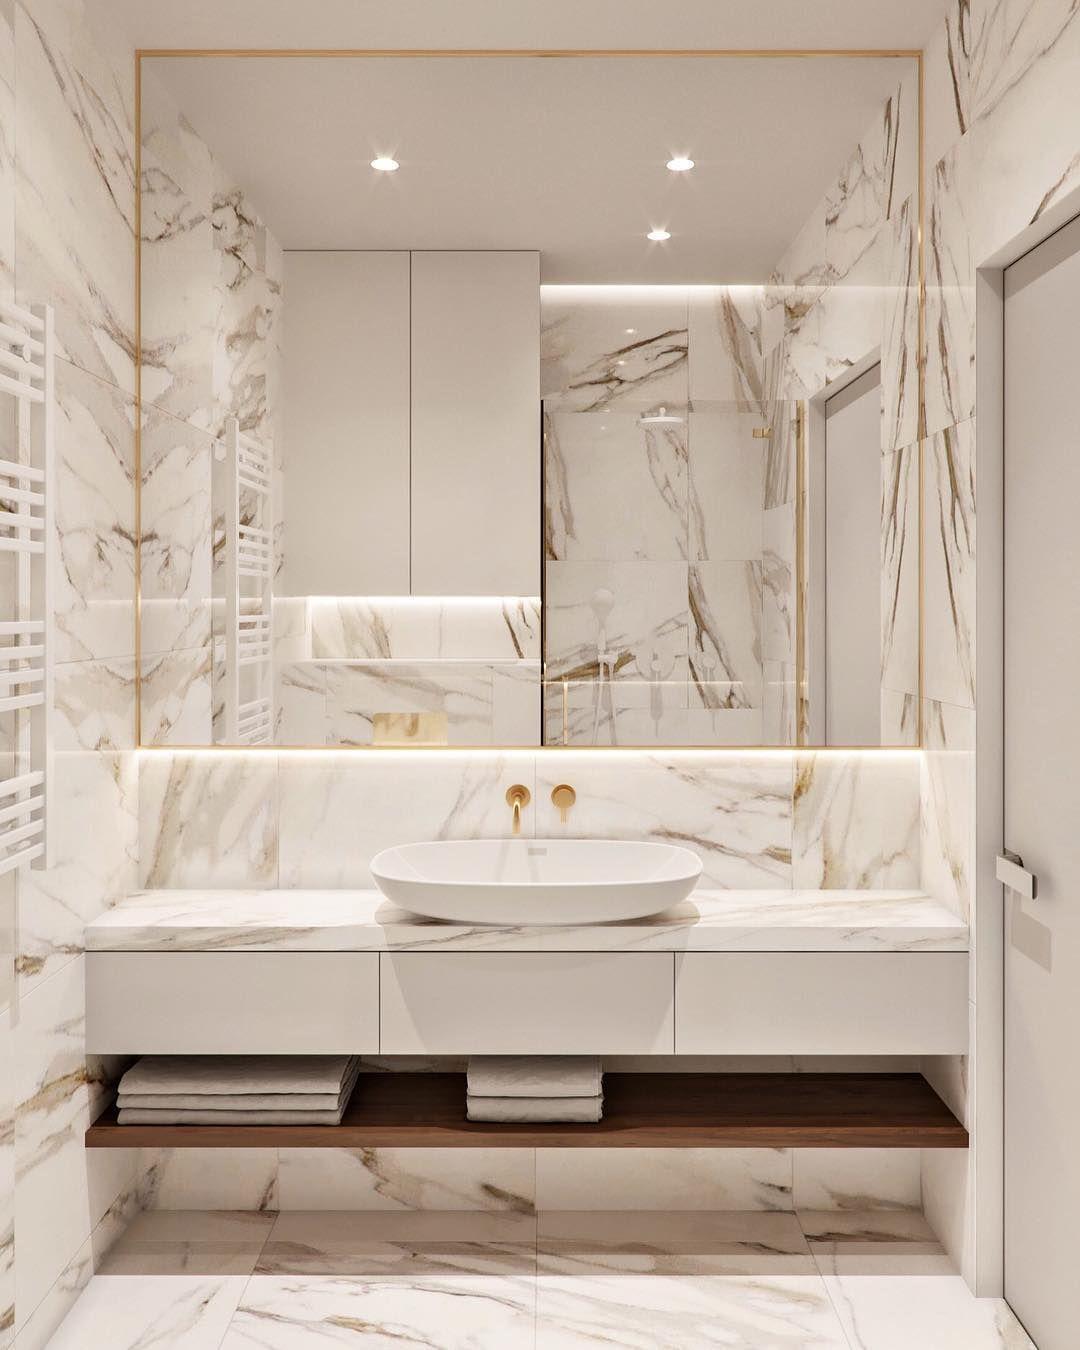 Luxury Bathroom Ideas Is Unconditionally Important For Your Home Whether You Choose The Lux Luxusbadezimmer Modernes Badezimmerdesign Kleine Badezimmer Design